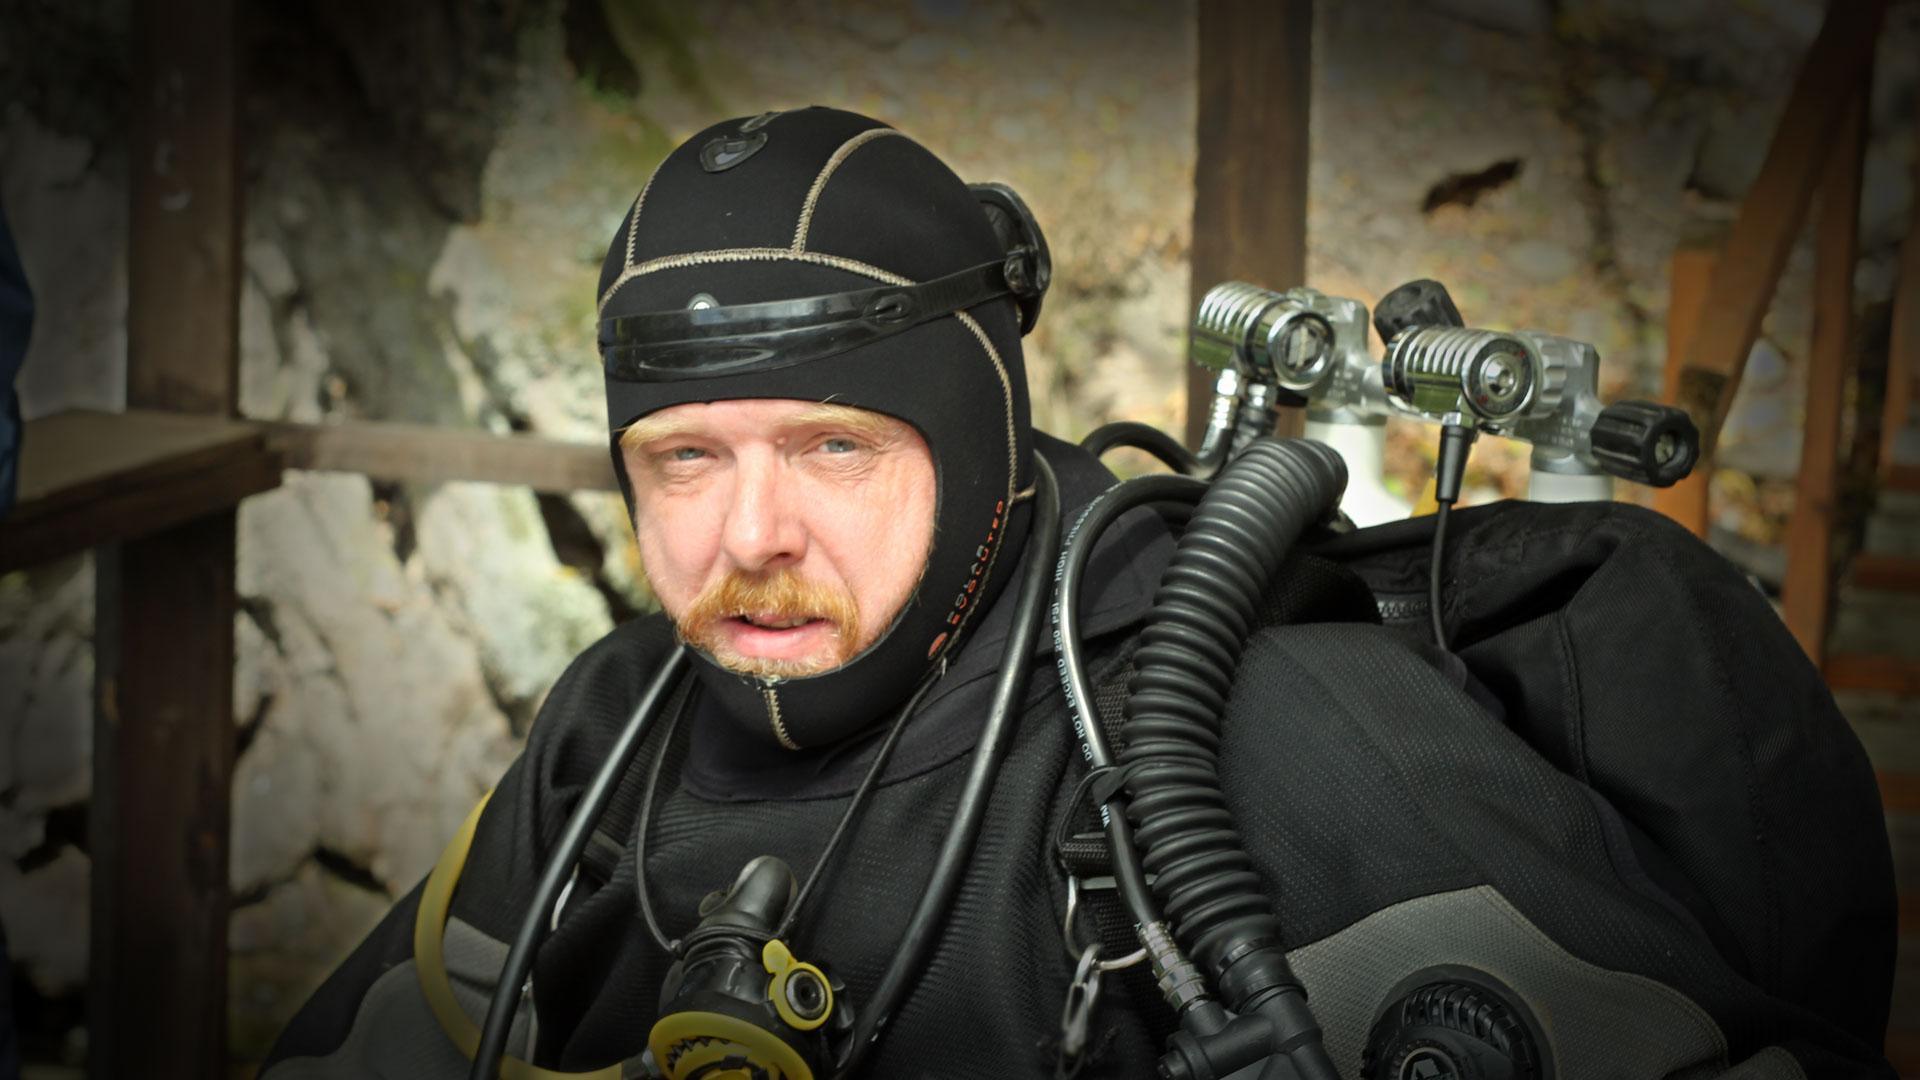 Евгений Корчагин Advanced Recreational Trimix Diver IANTD – поздравляем!